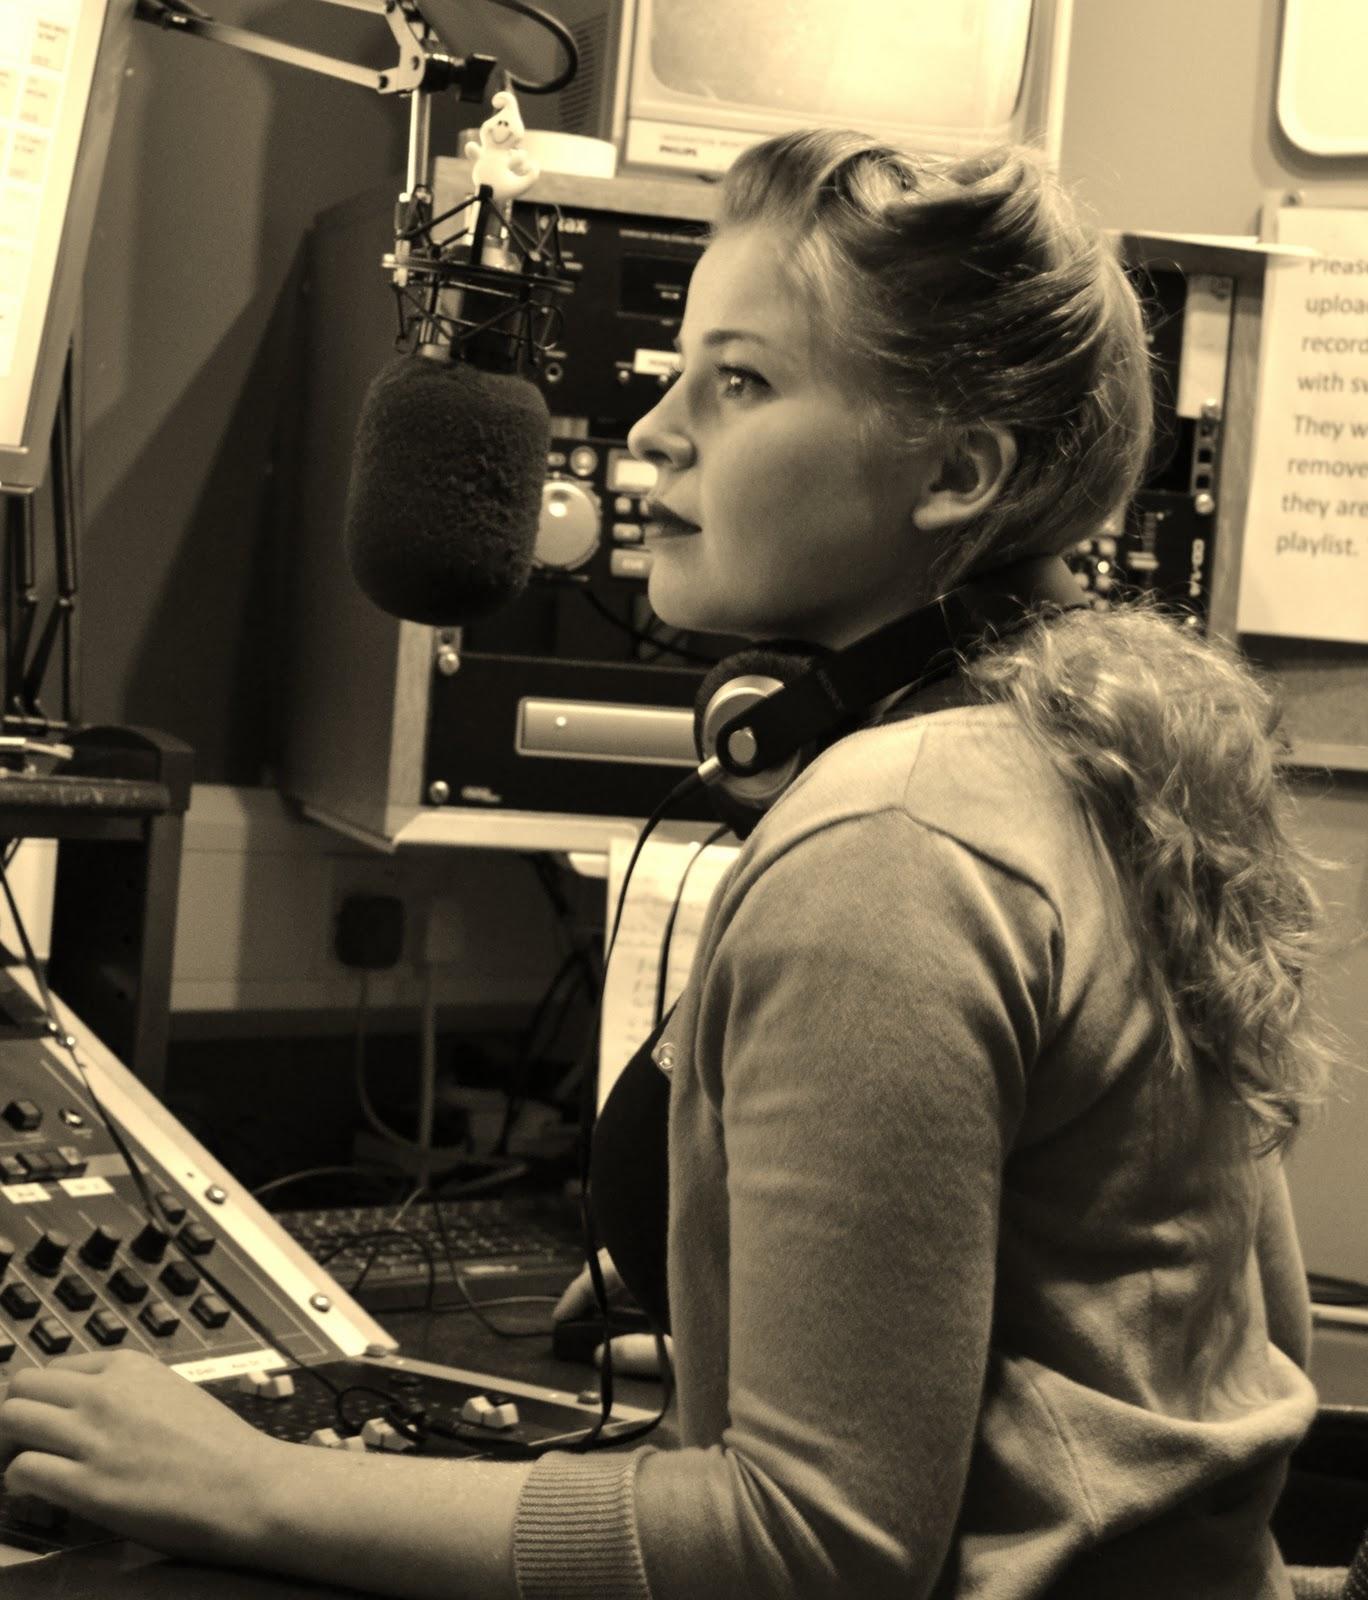 Vintage Radio Station Logo Her saturday show is her